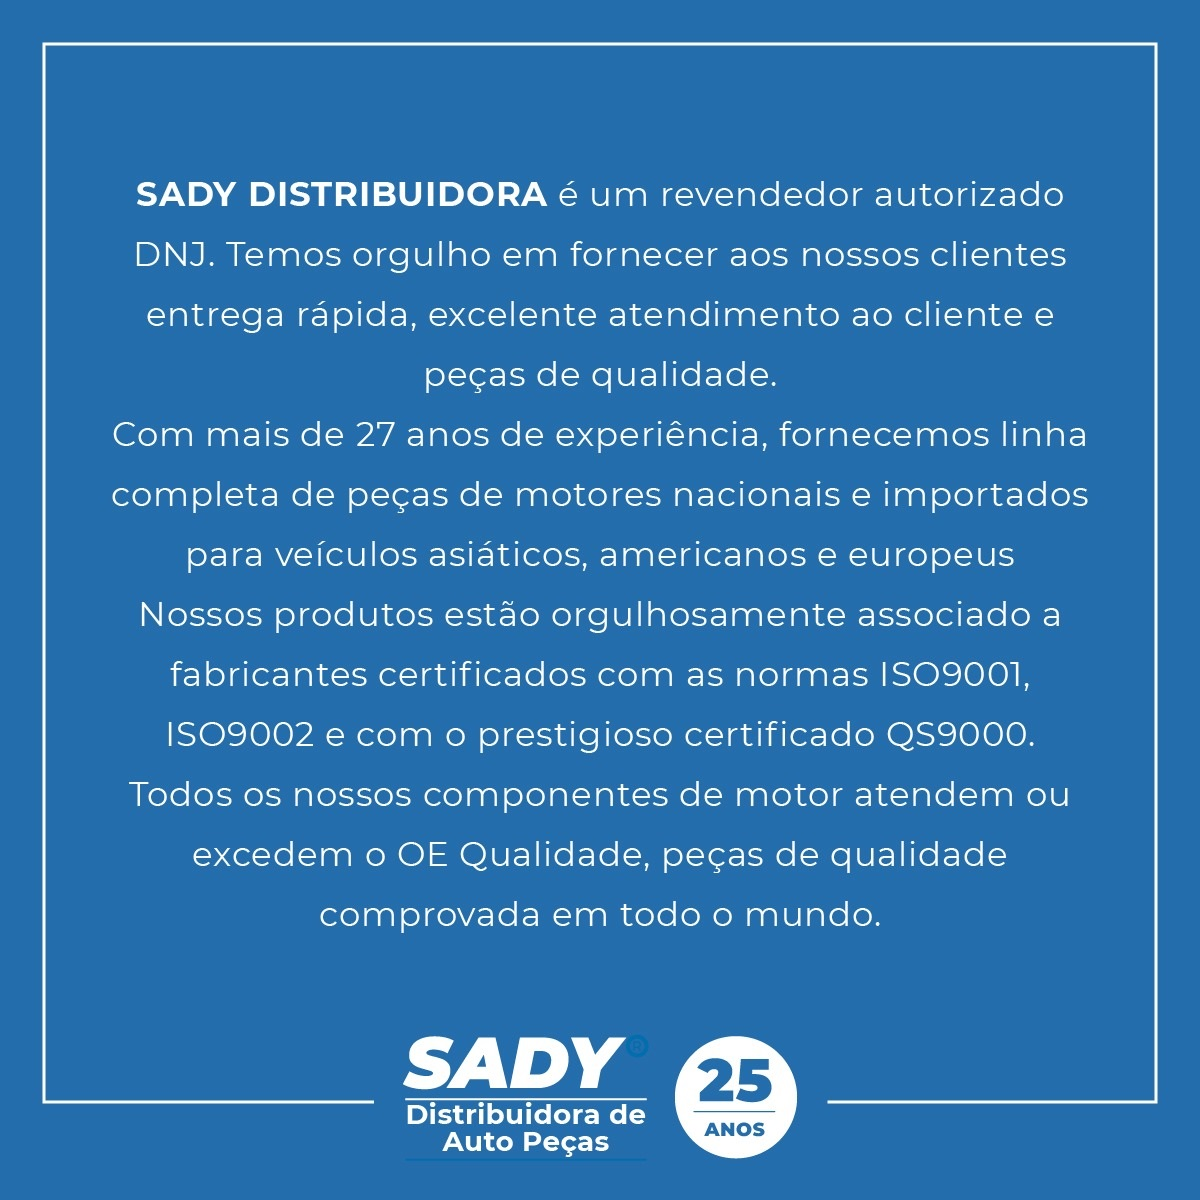 BOMBA DE OLEO DO MOTOR FIAT 2.4 20V